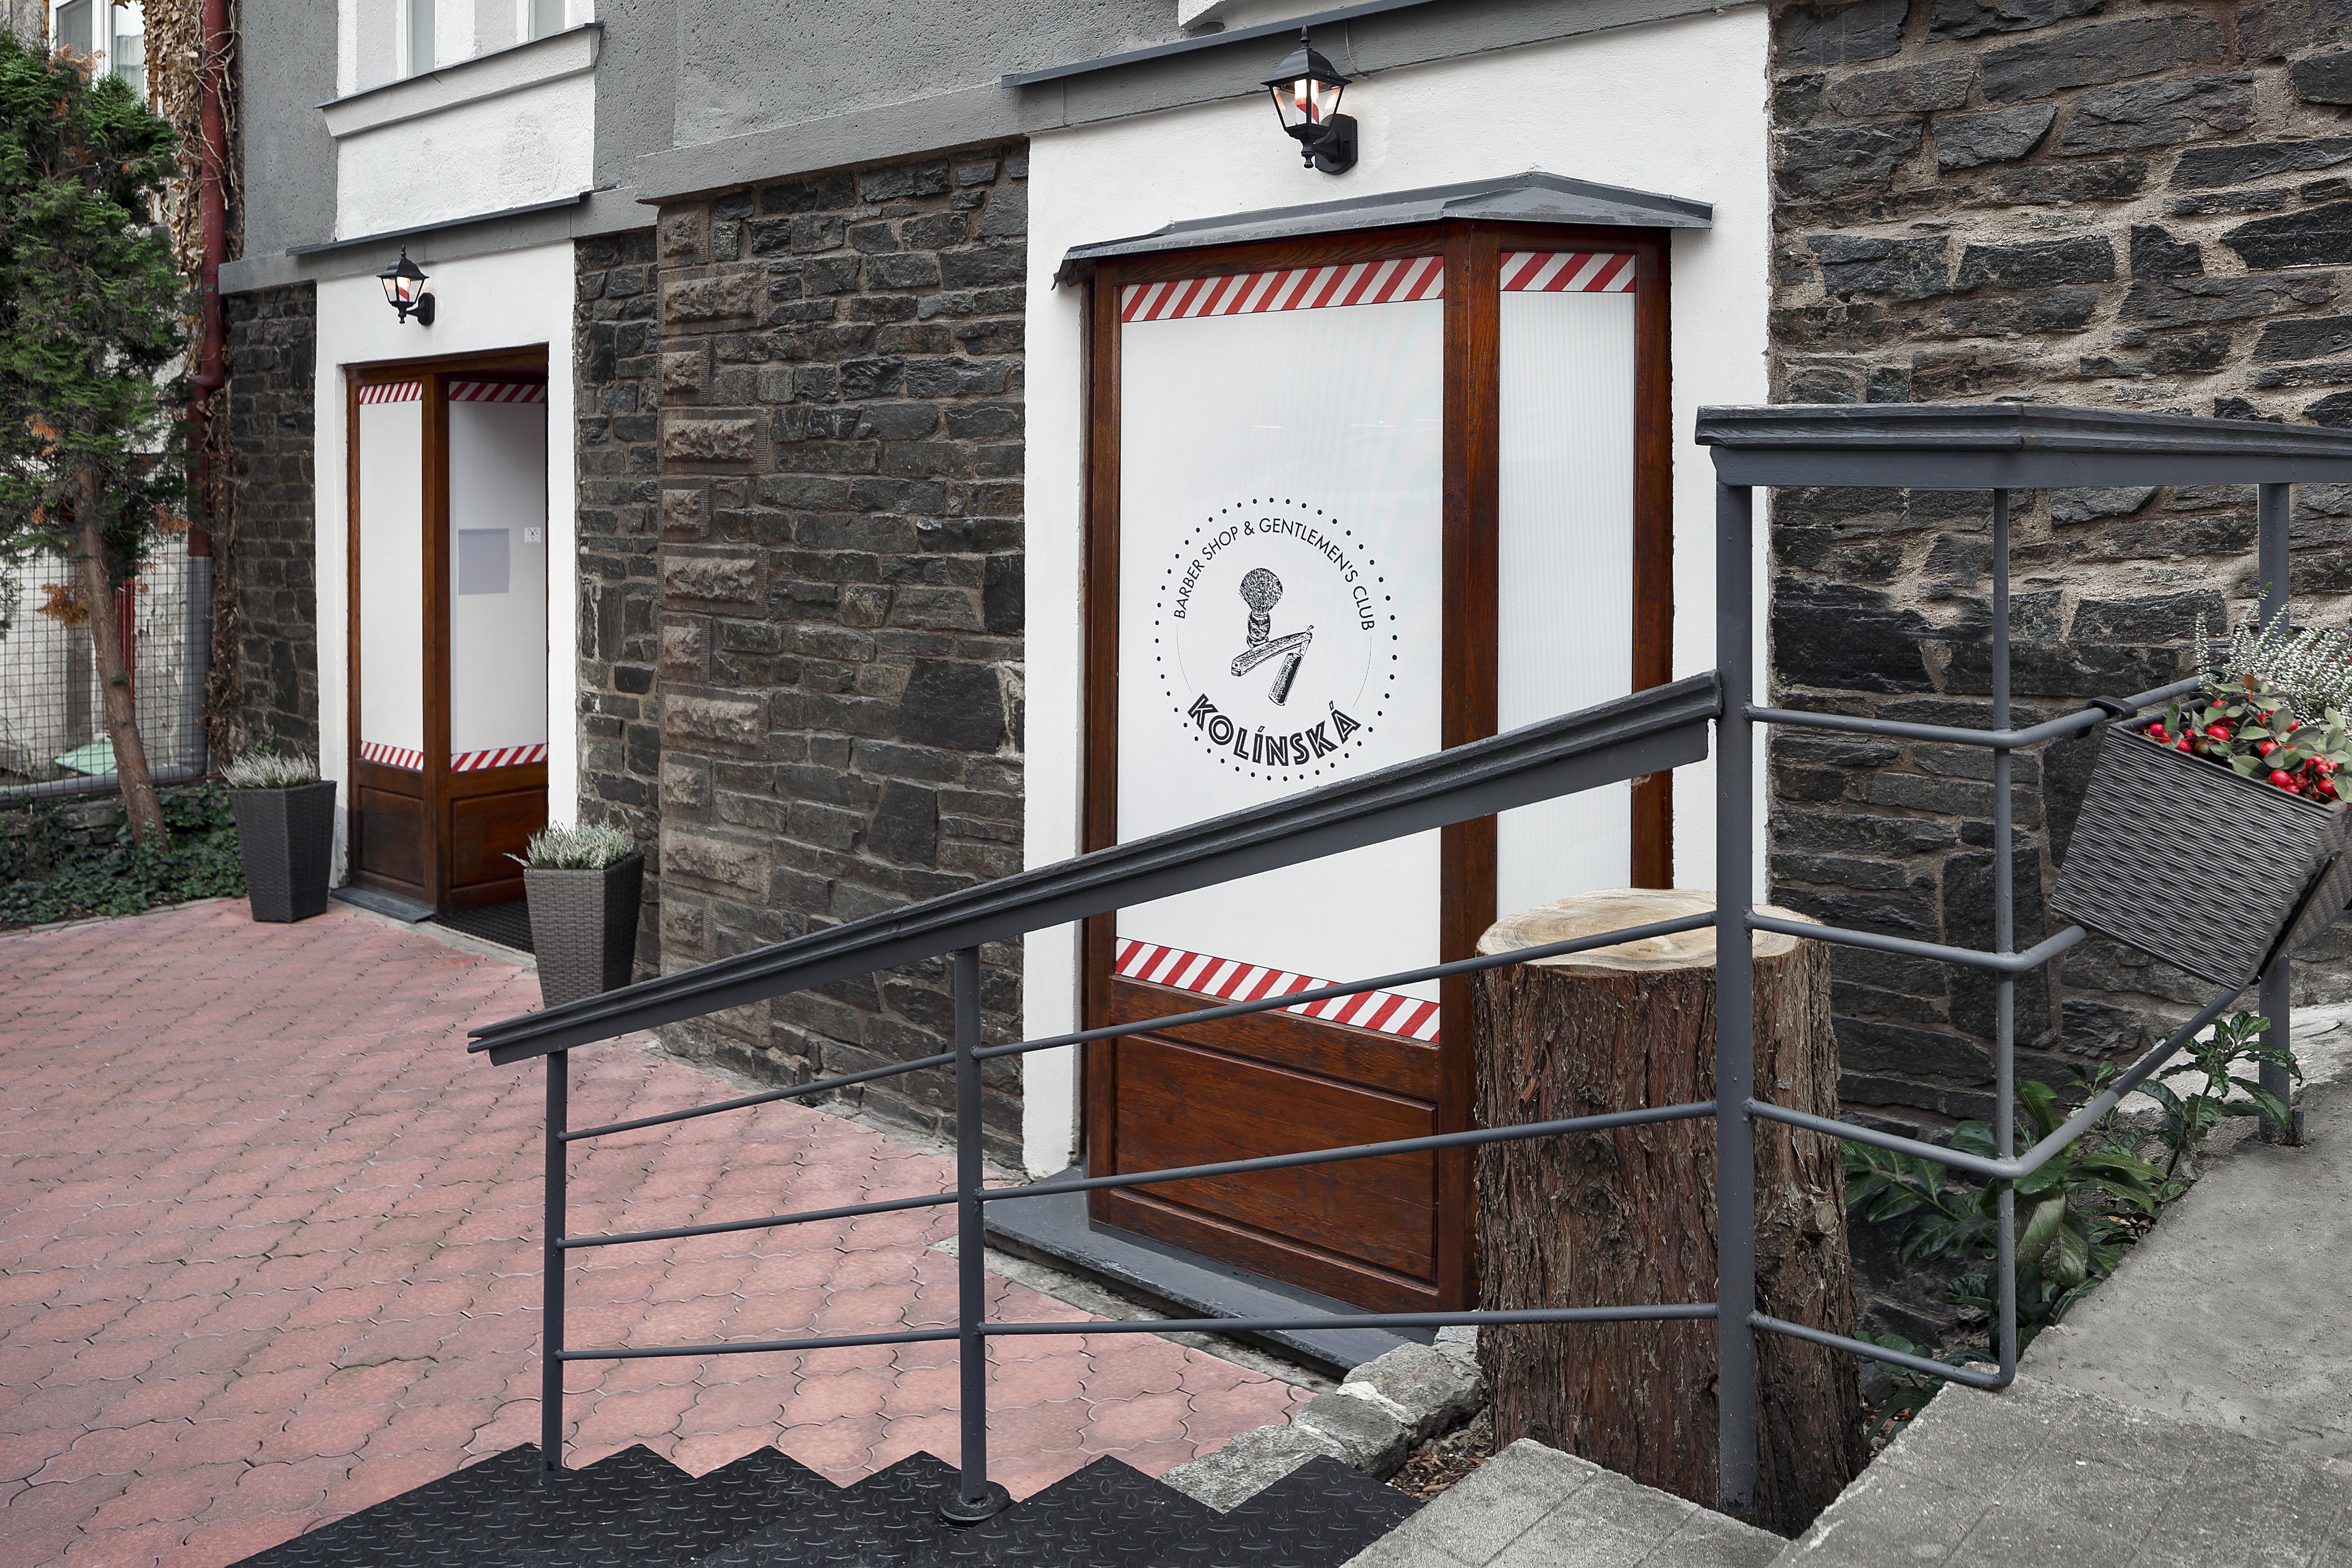 Kolínská Barbershop